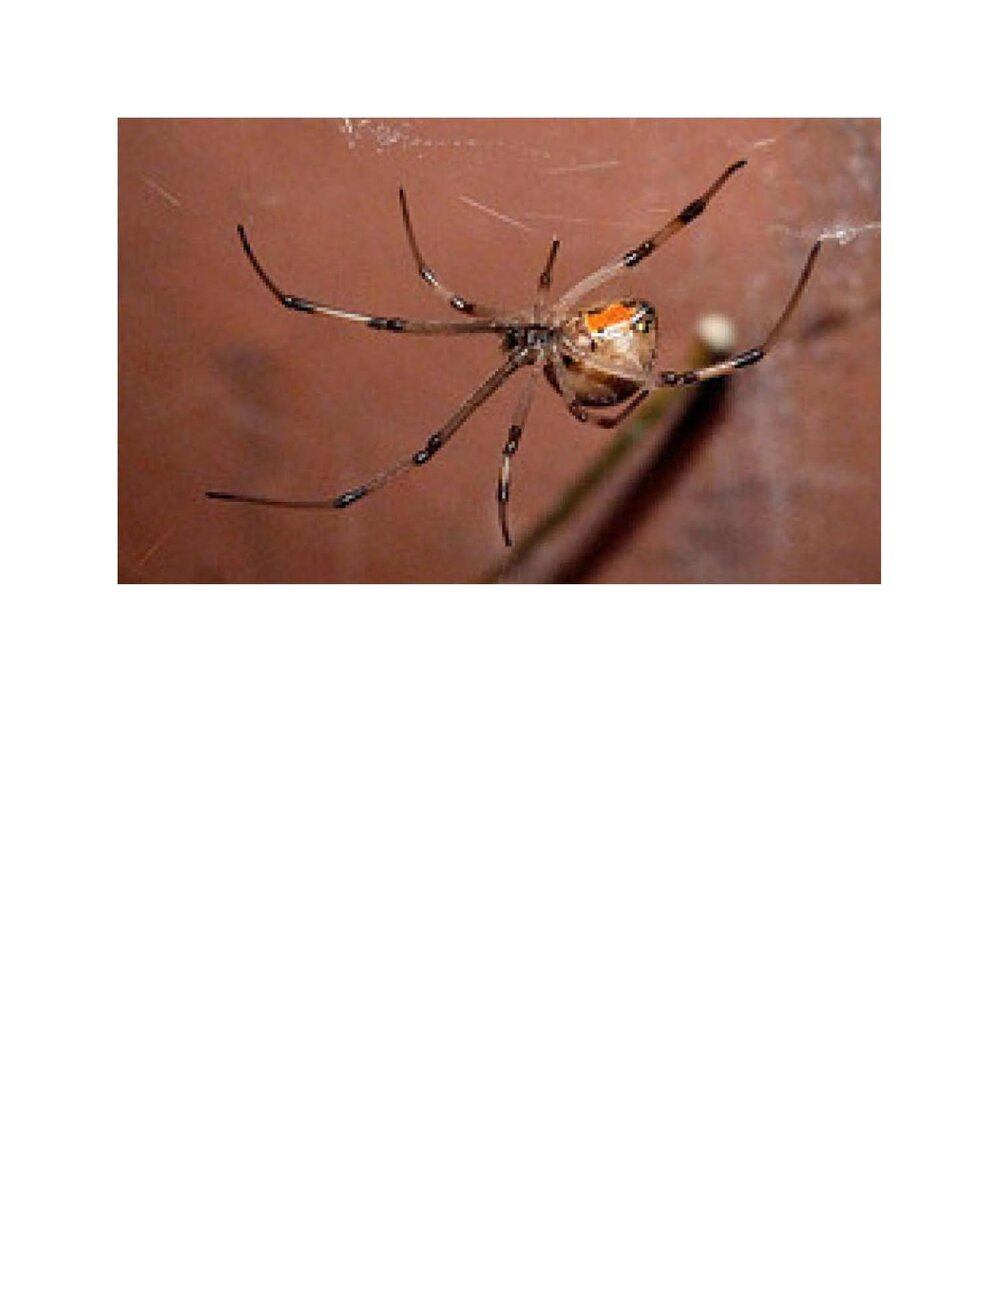 Spider on a Ship.jpg